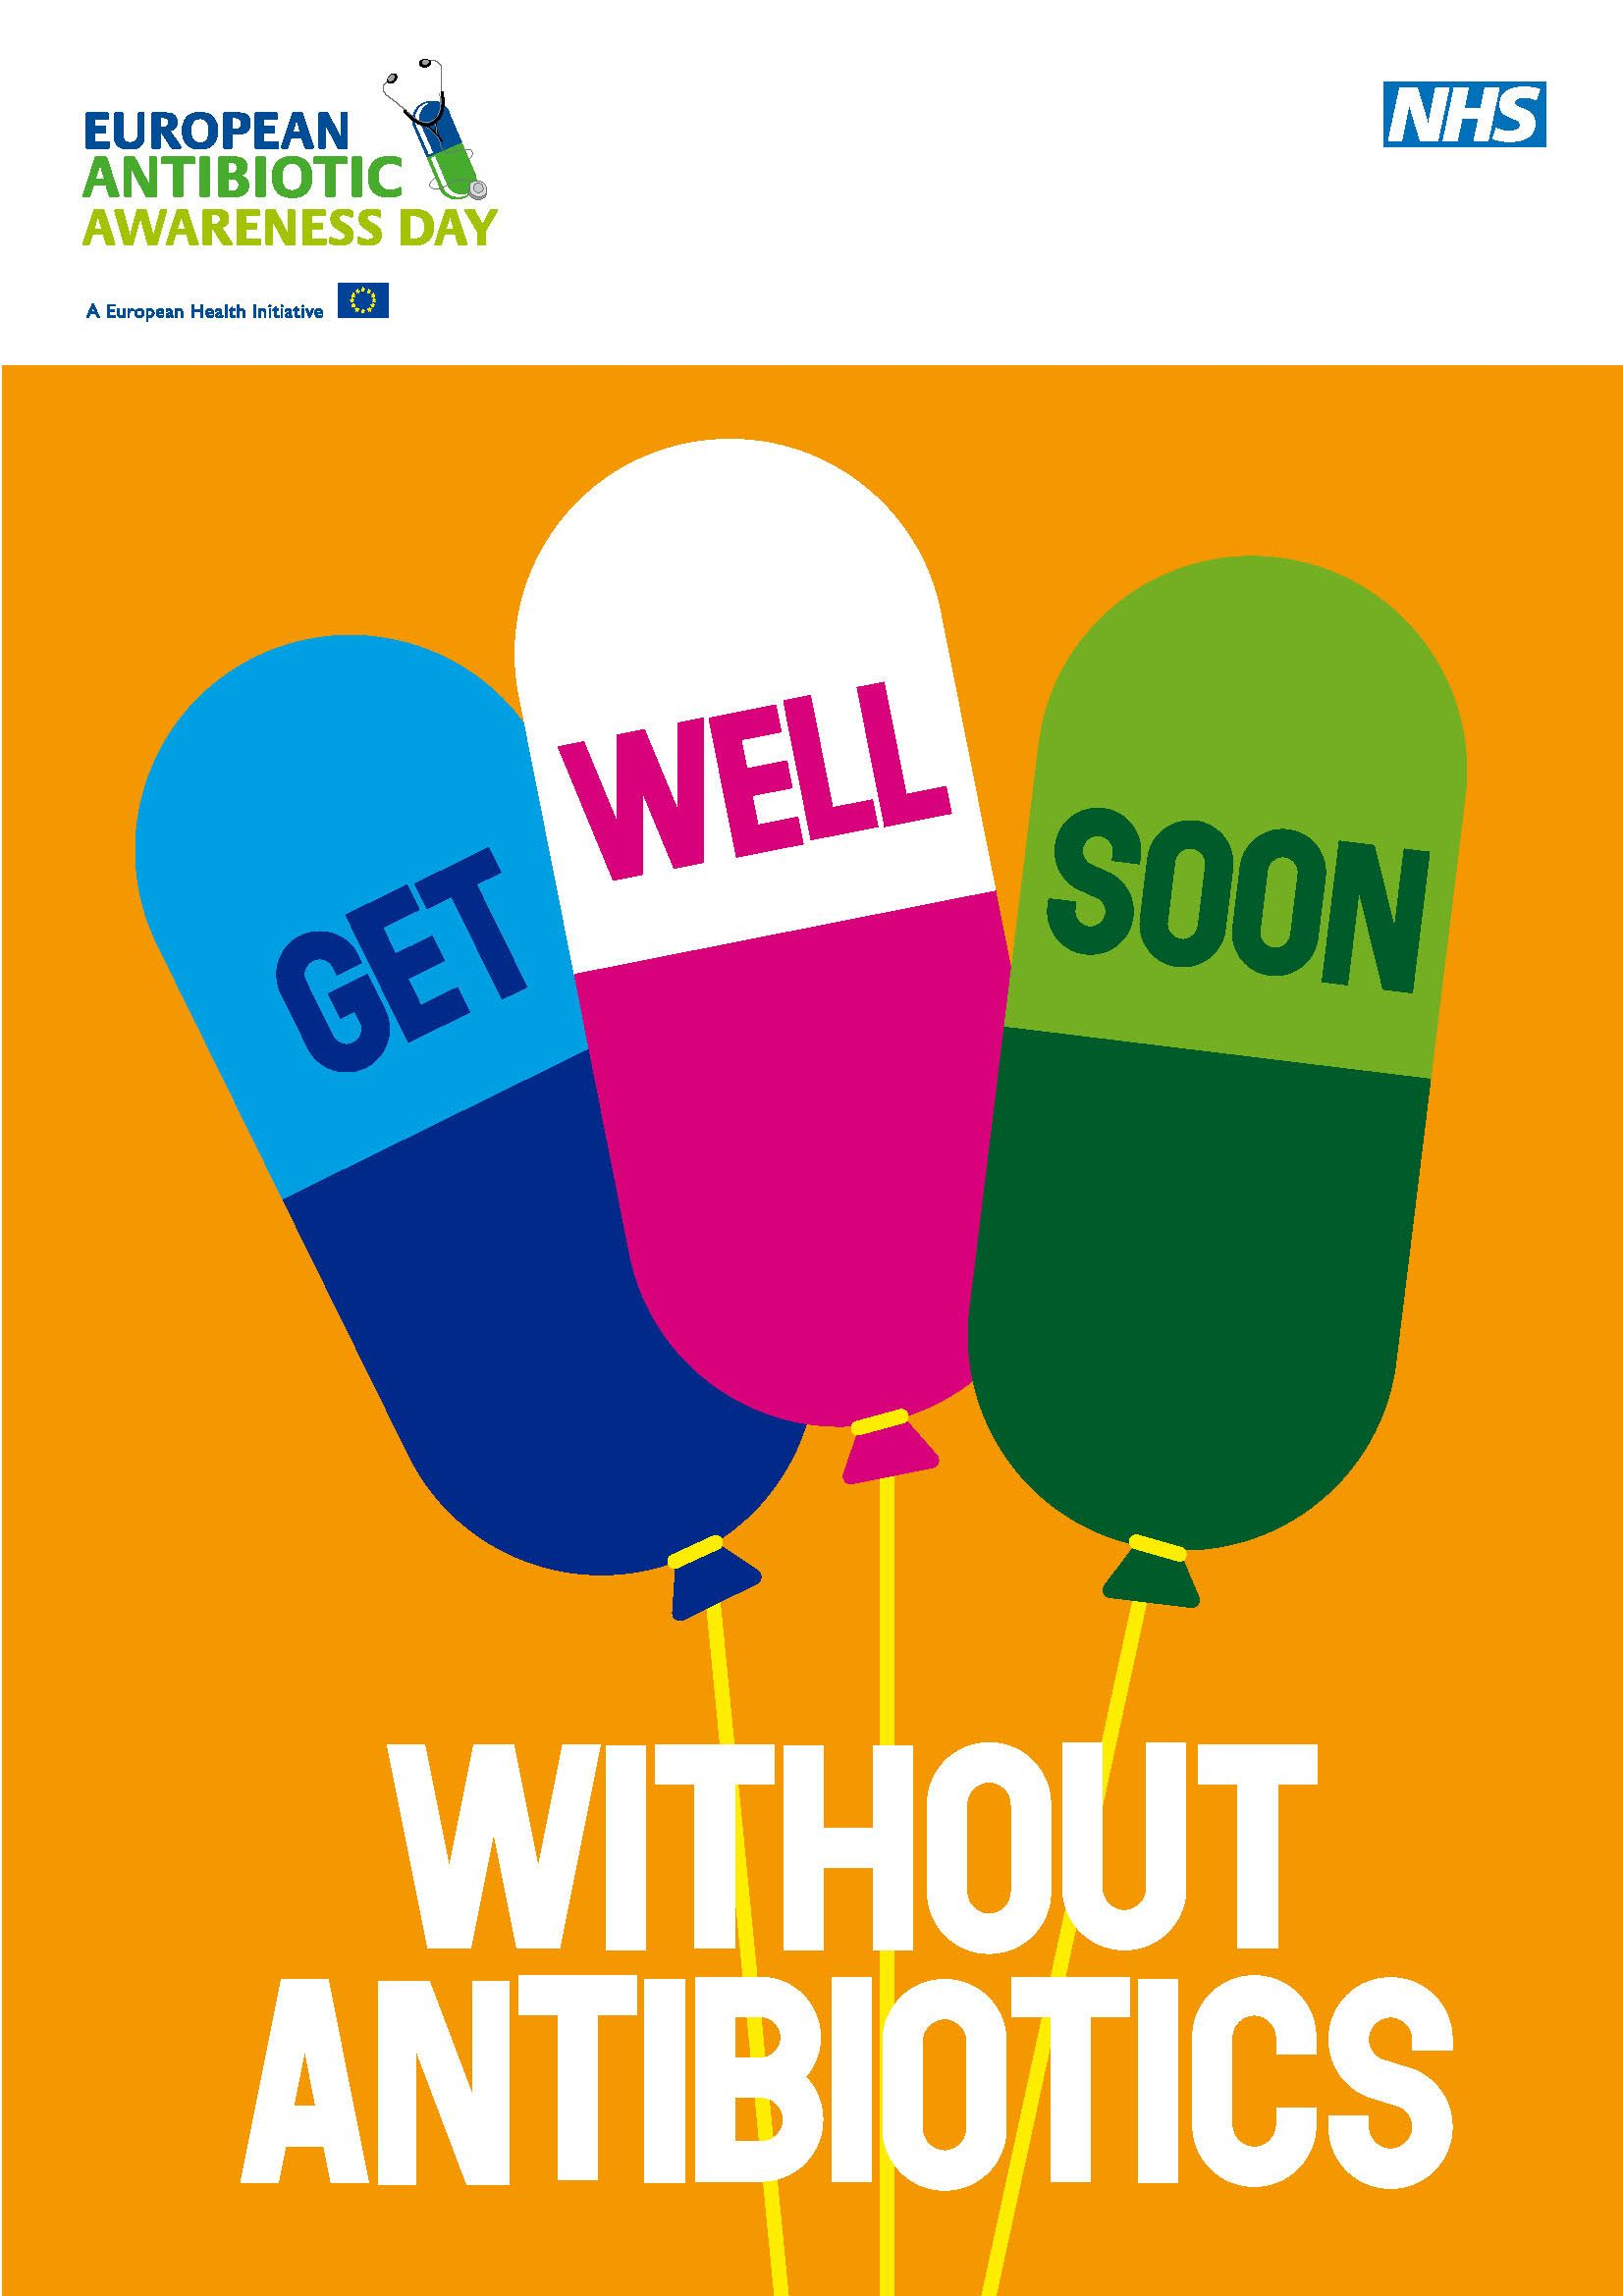 Polysporin Antibiotic Ear Drops + Pain Relief Treats Ear